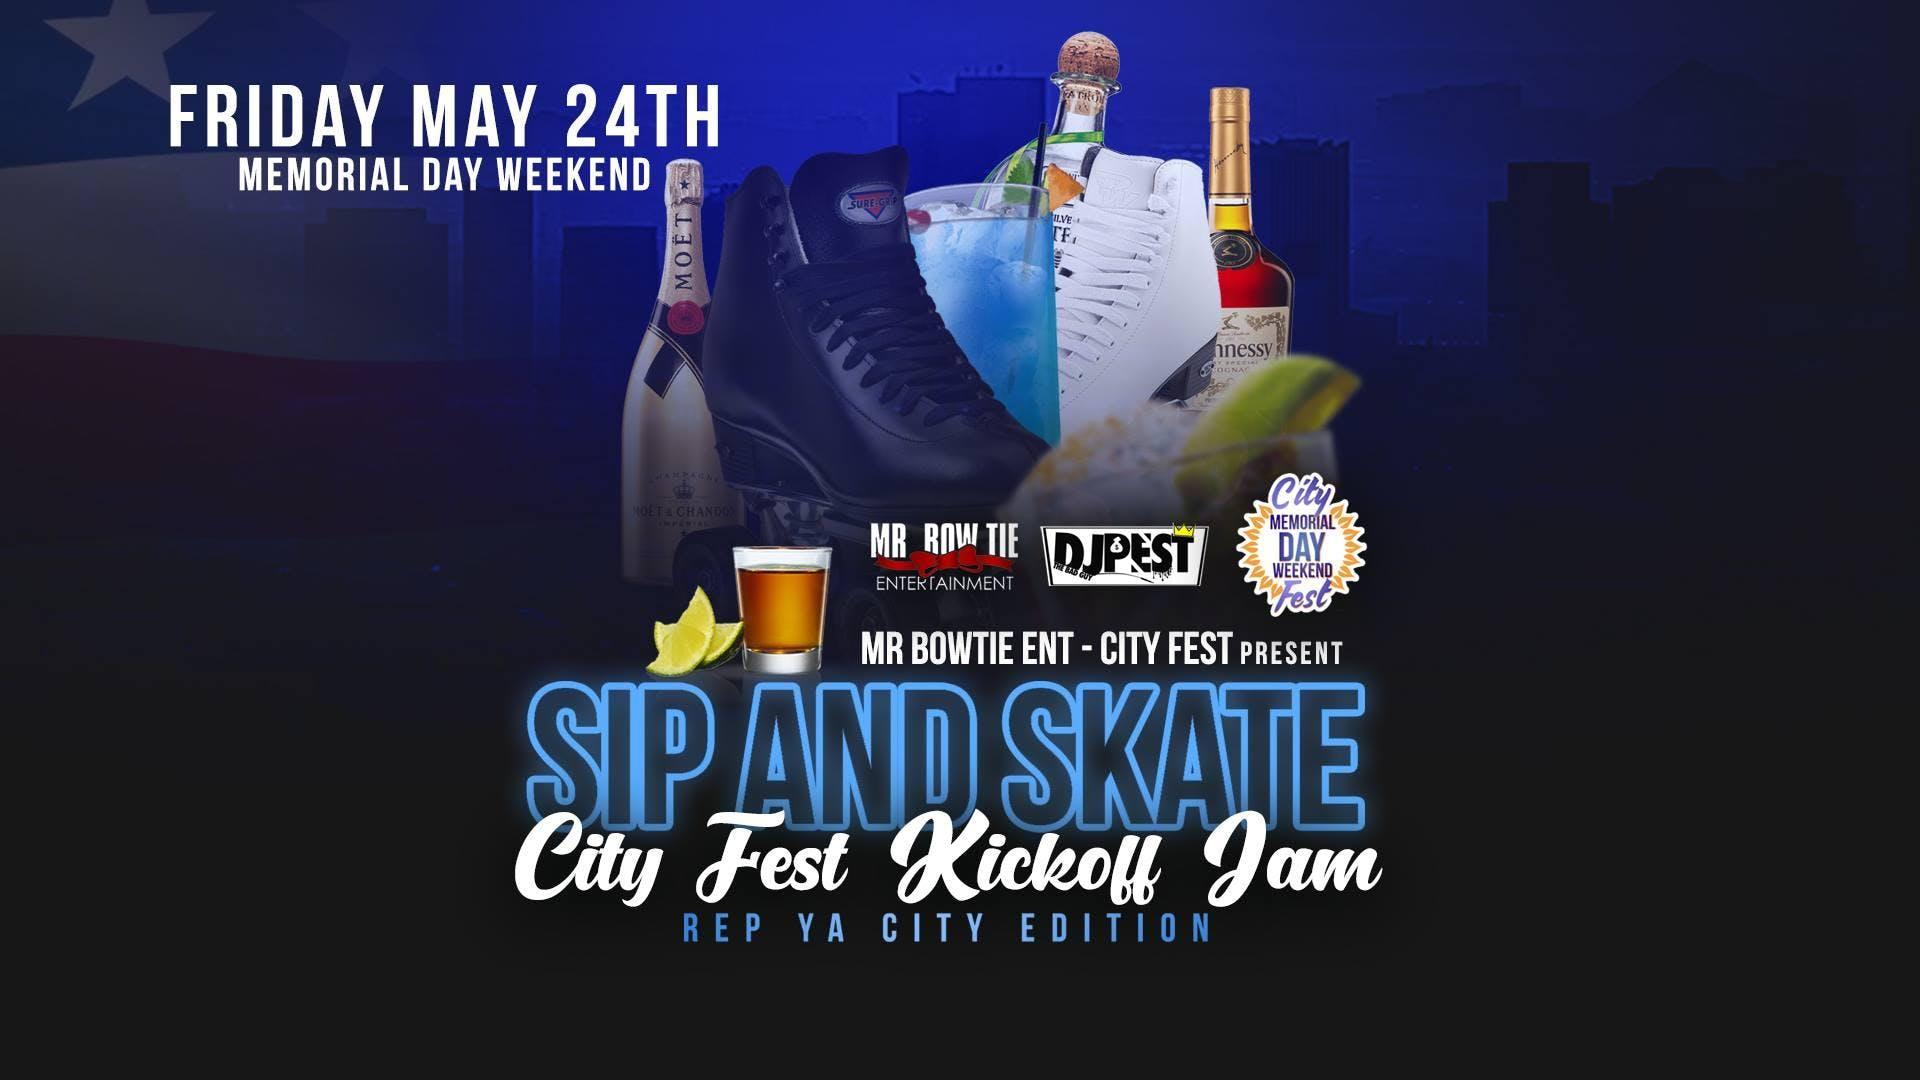 Sip And Skate City Fest Kickoff Jam